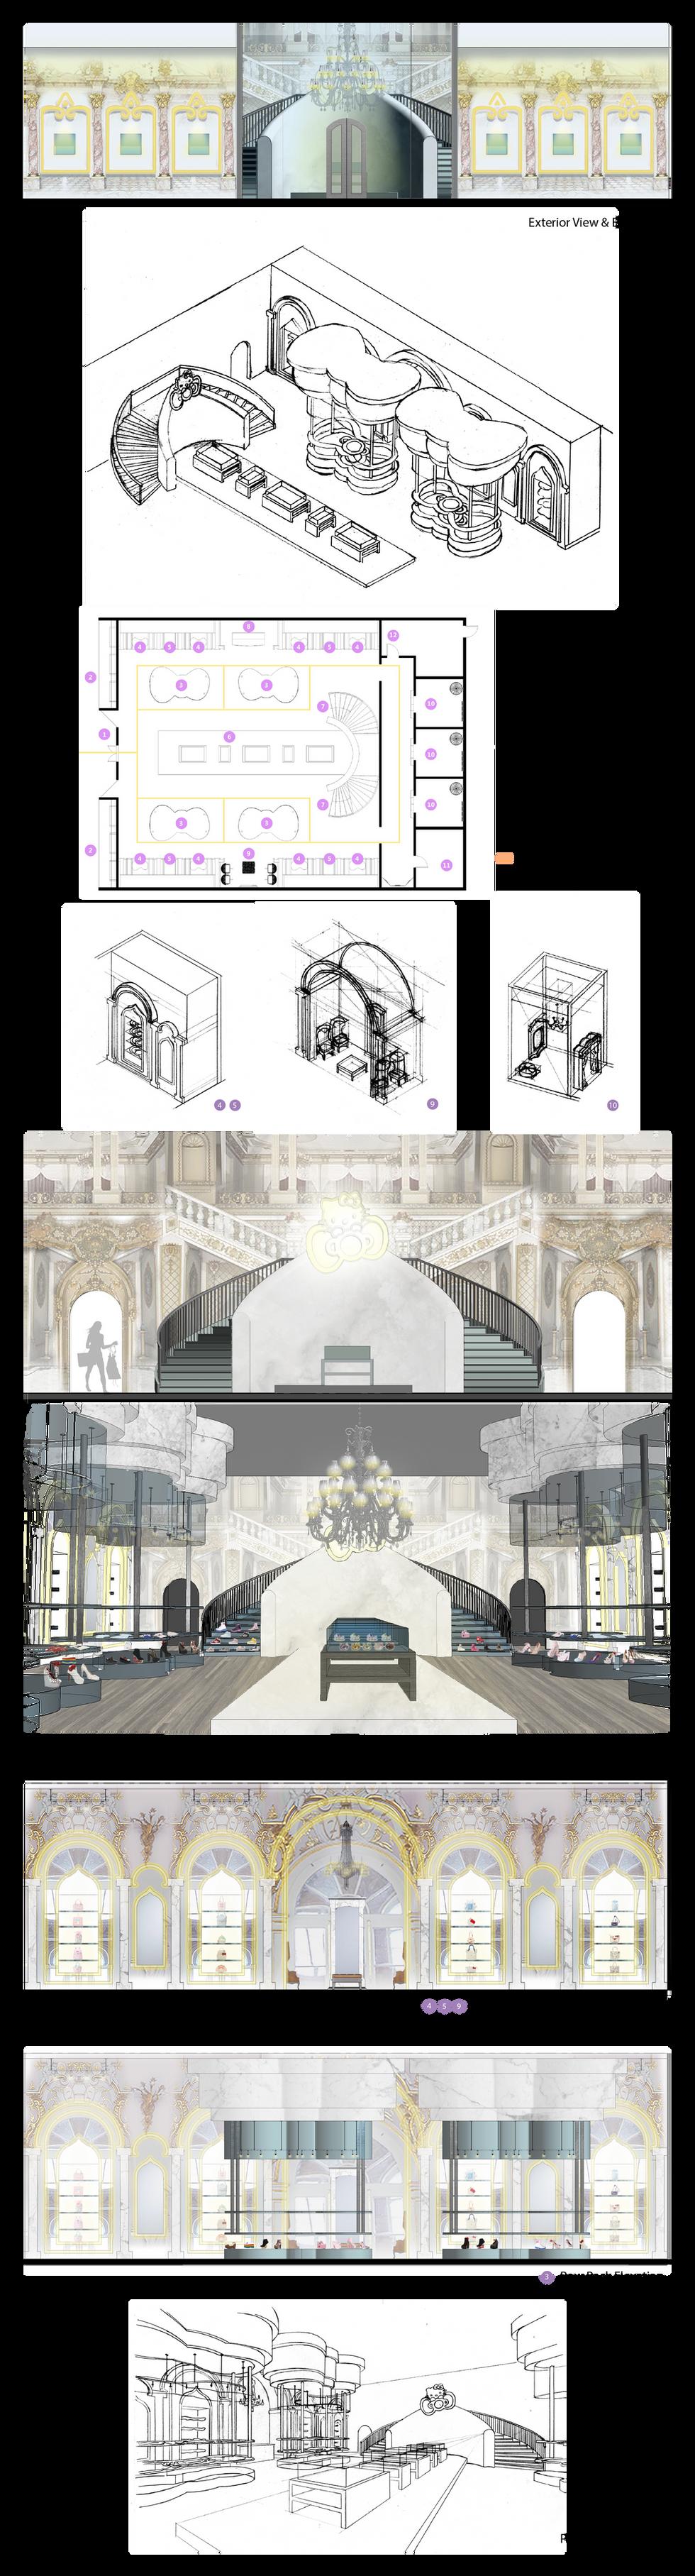 Sanrio Retail-02_Sanrio Retail.png